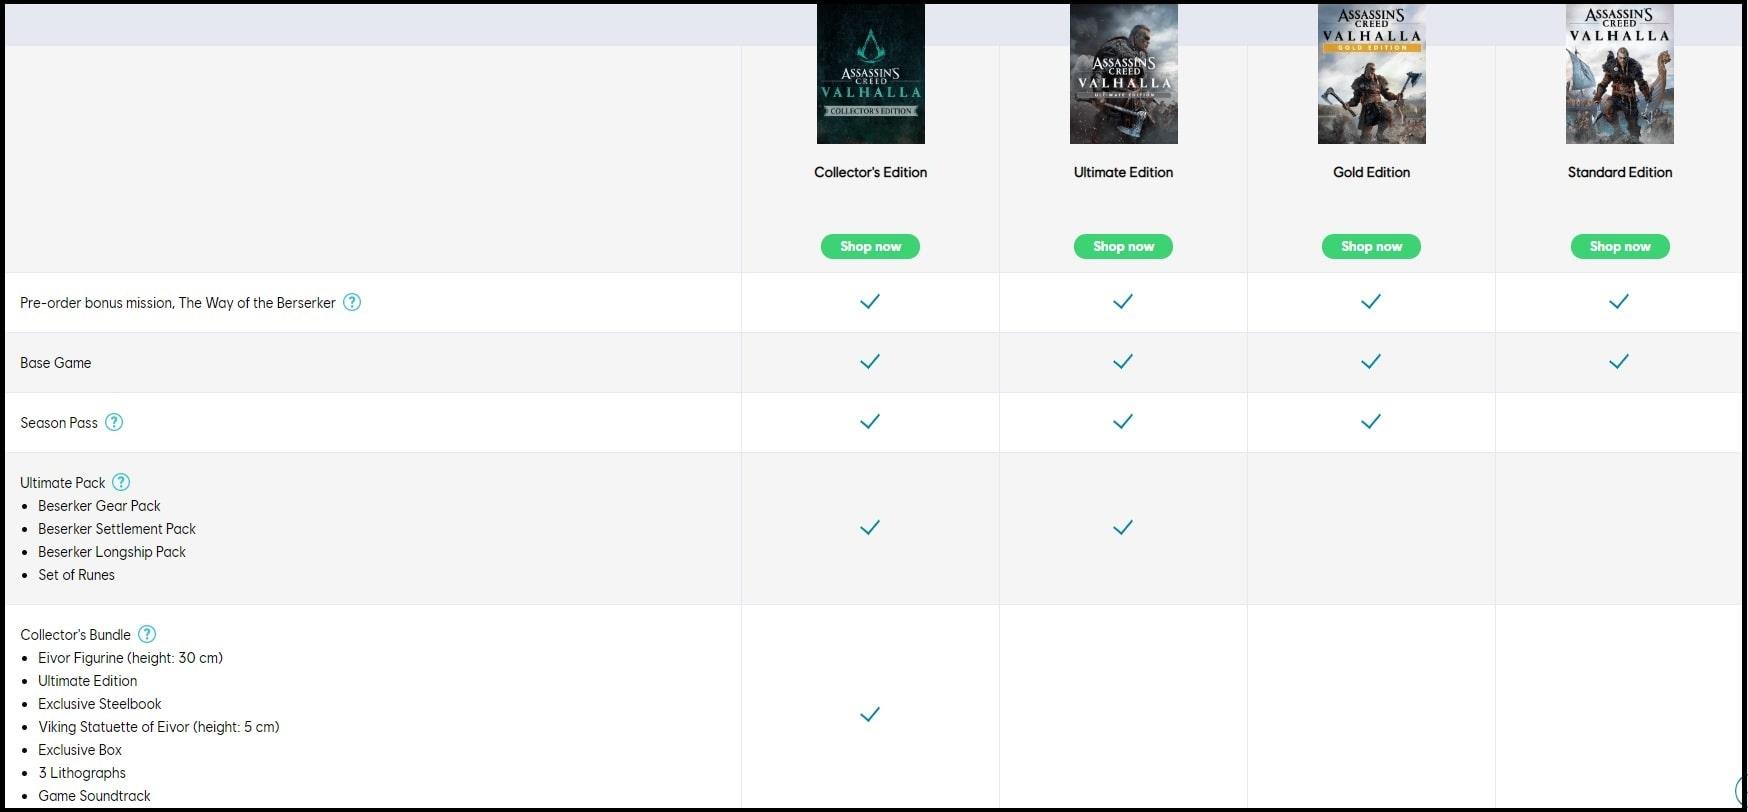 Assassins Creed 2222date october min - خرید سی دی کی اورجینال Assassin's Creed Valhalla